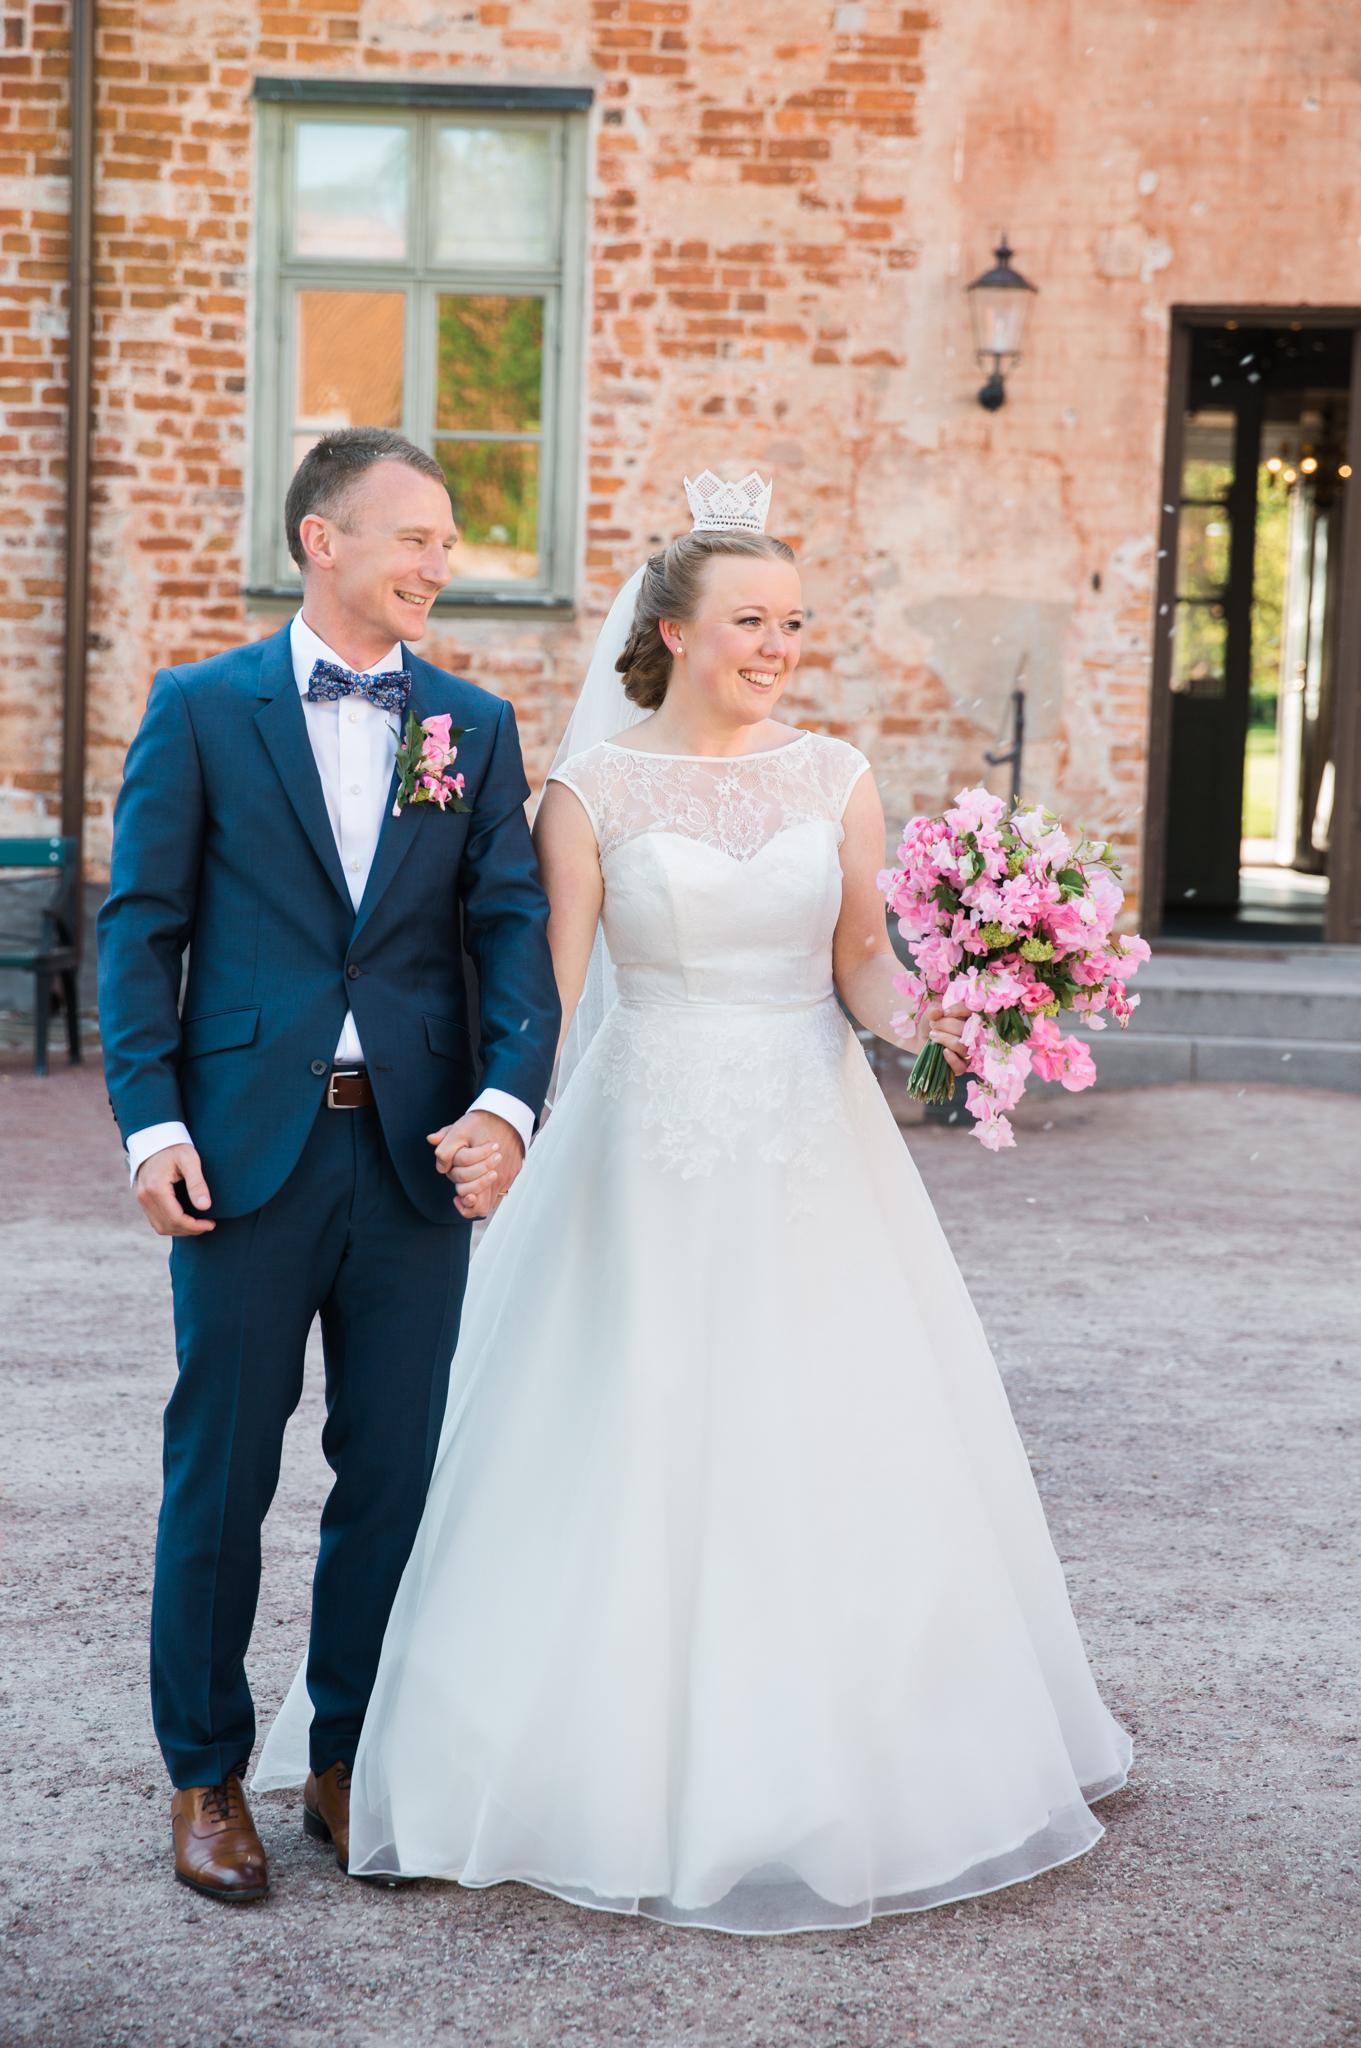 ViOli Photography bröllopsfotograf-Karlshamn-Blekinge-Ronneby-Karlskrona-Sölvesborg-Bromölla-Kristianstad (27 av 35)